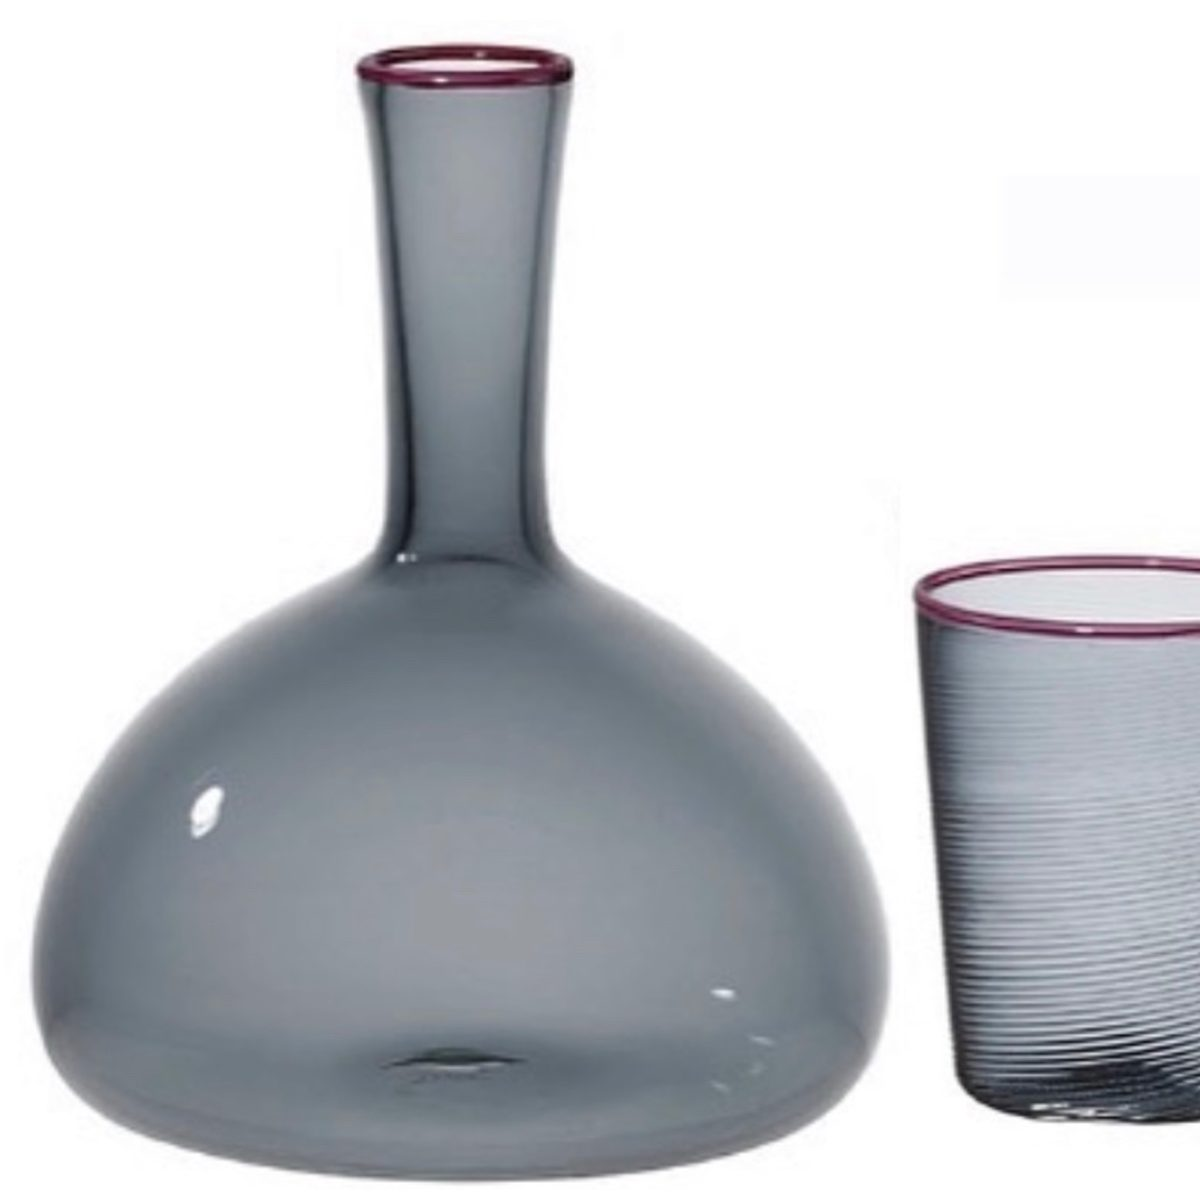 roi-glass-jug-grey-dior-pink